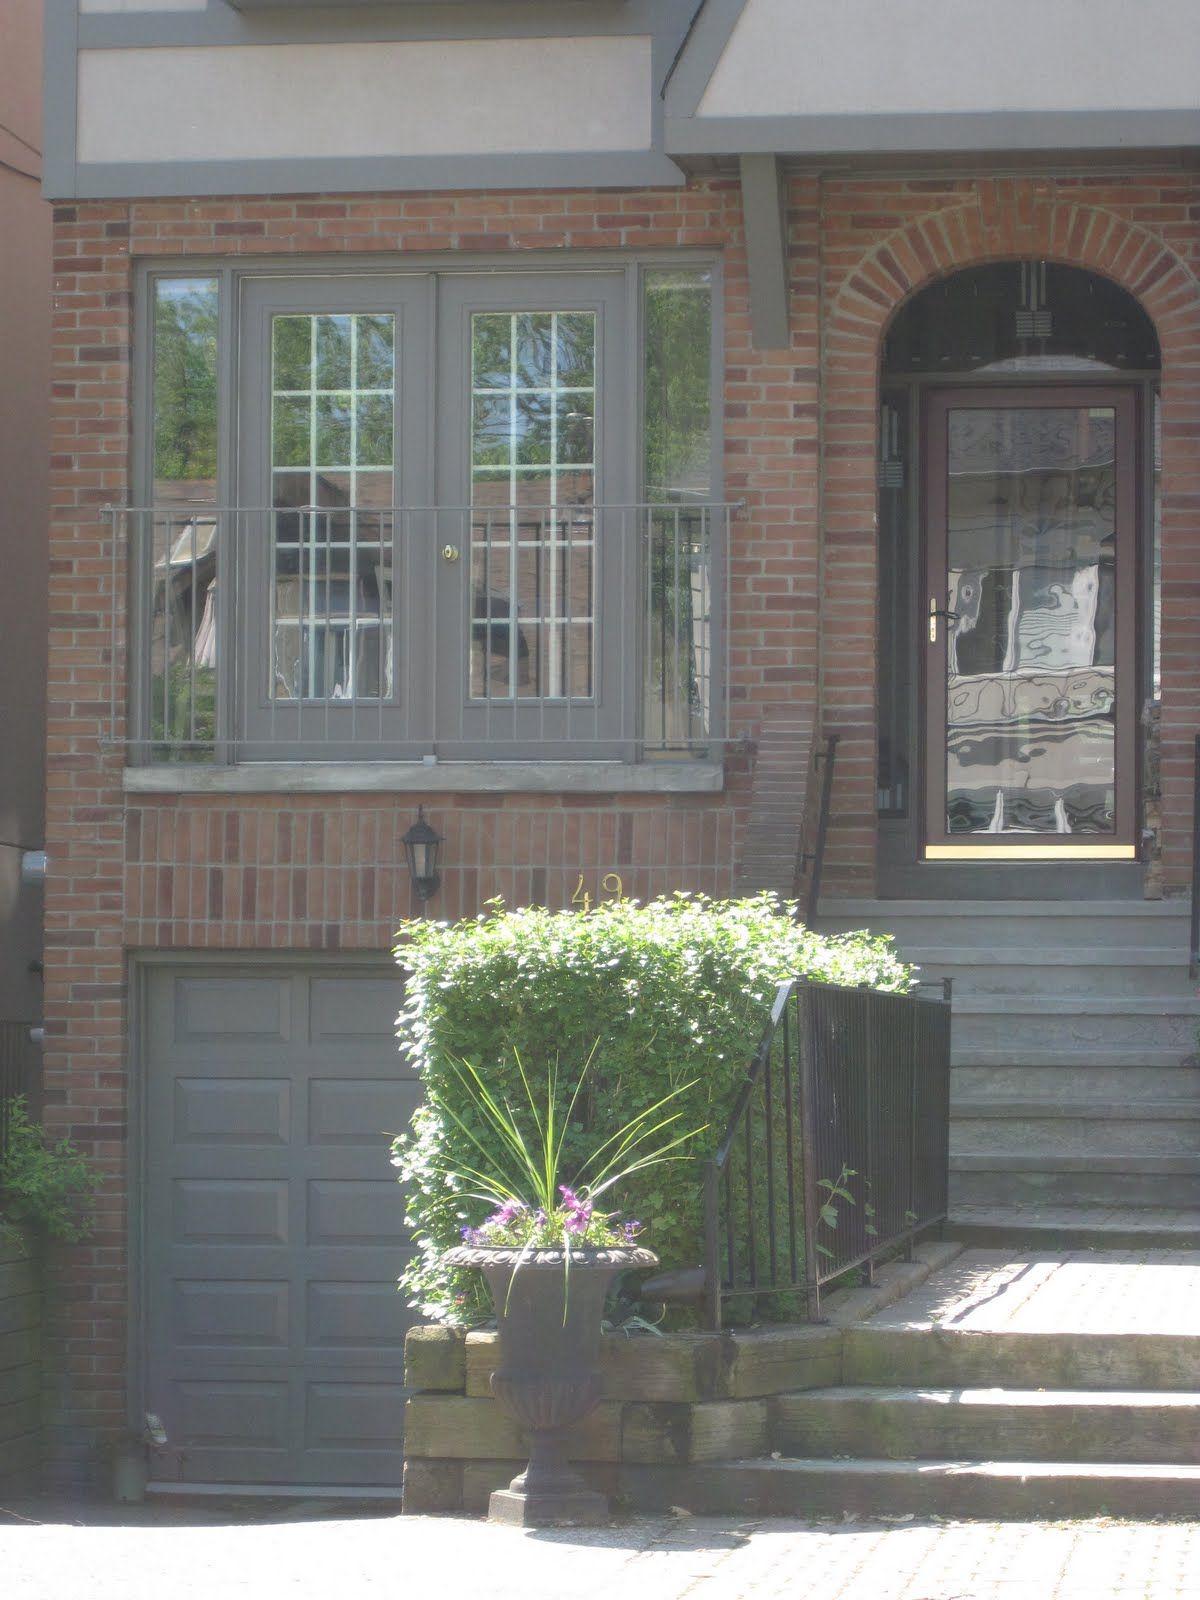 The Best Exterior Trim Colours With Brick Not Cloud White Maria Killam The True Colour Expert Exterior Paint Colors For House House Paint Exterior Exterior Brick